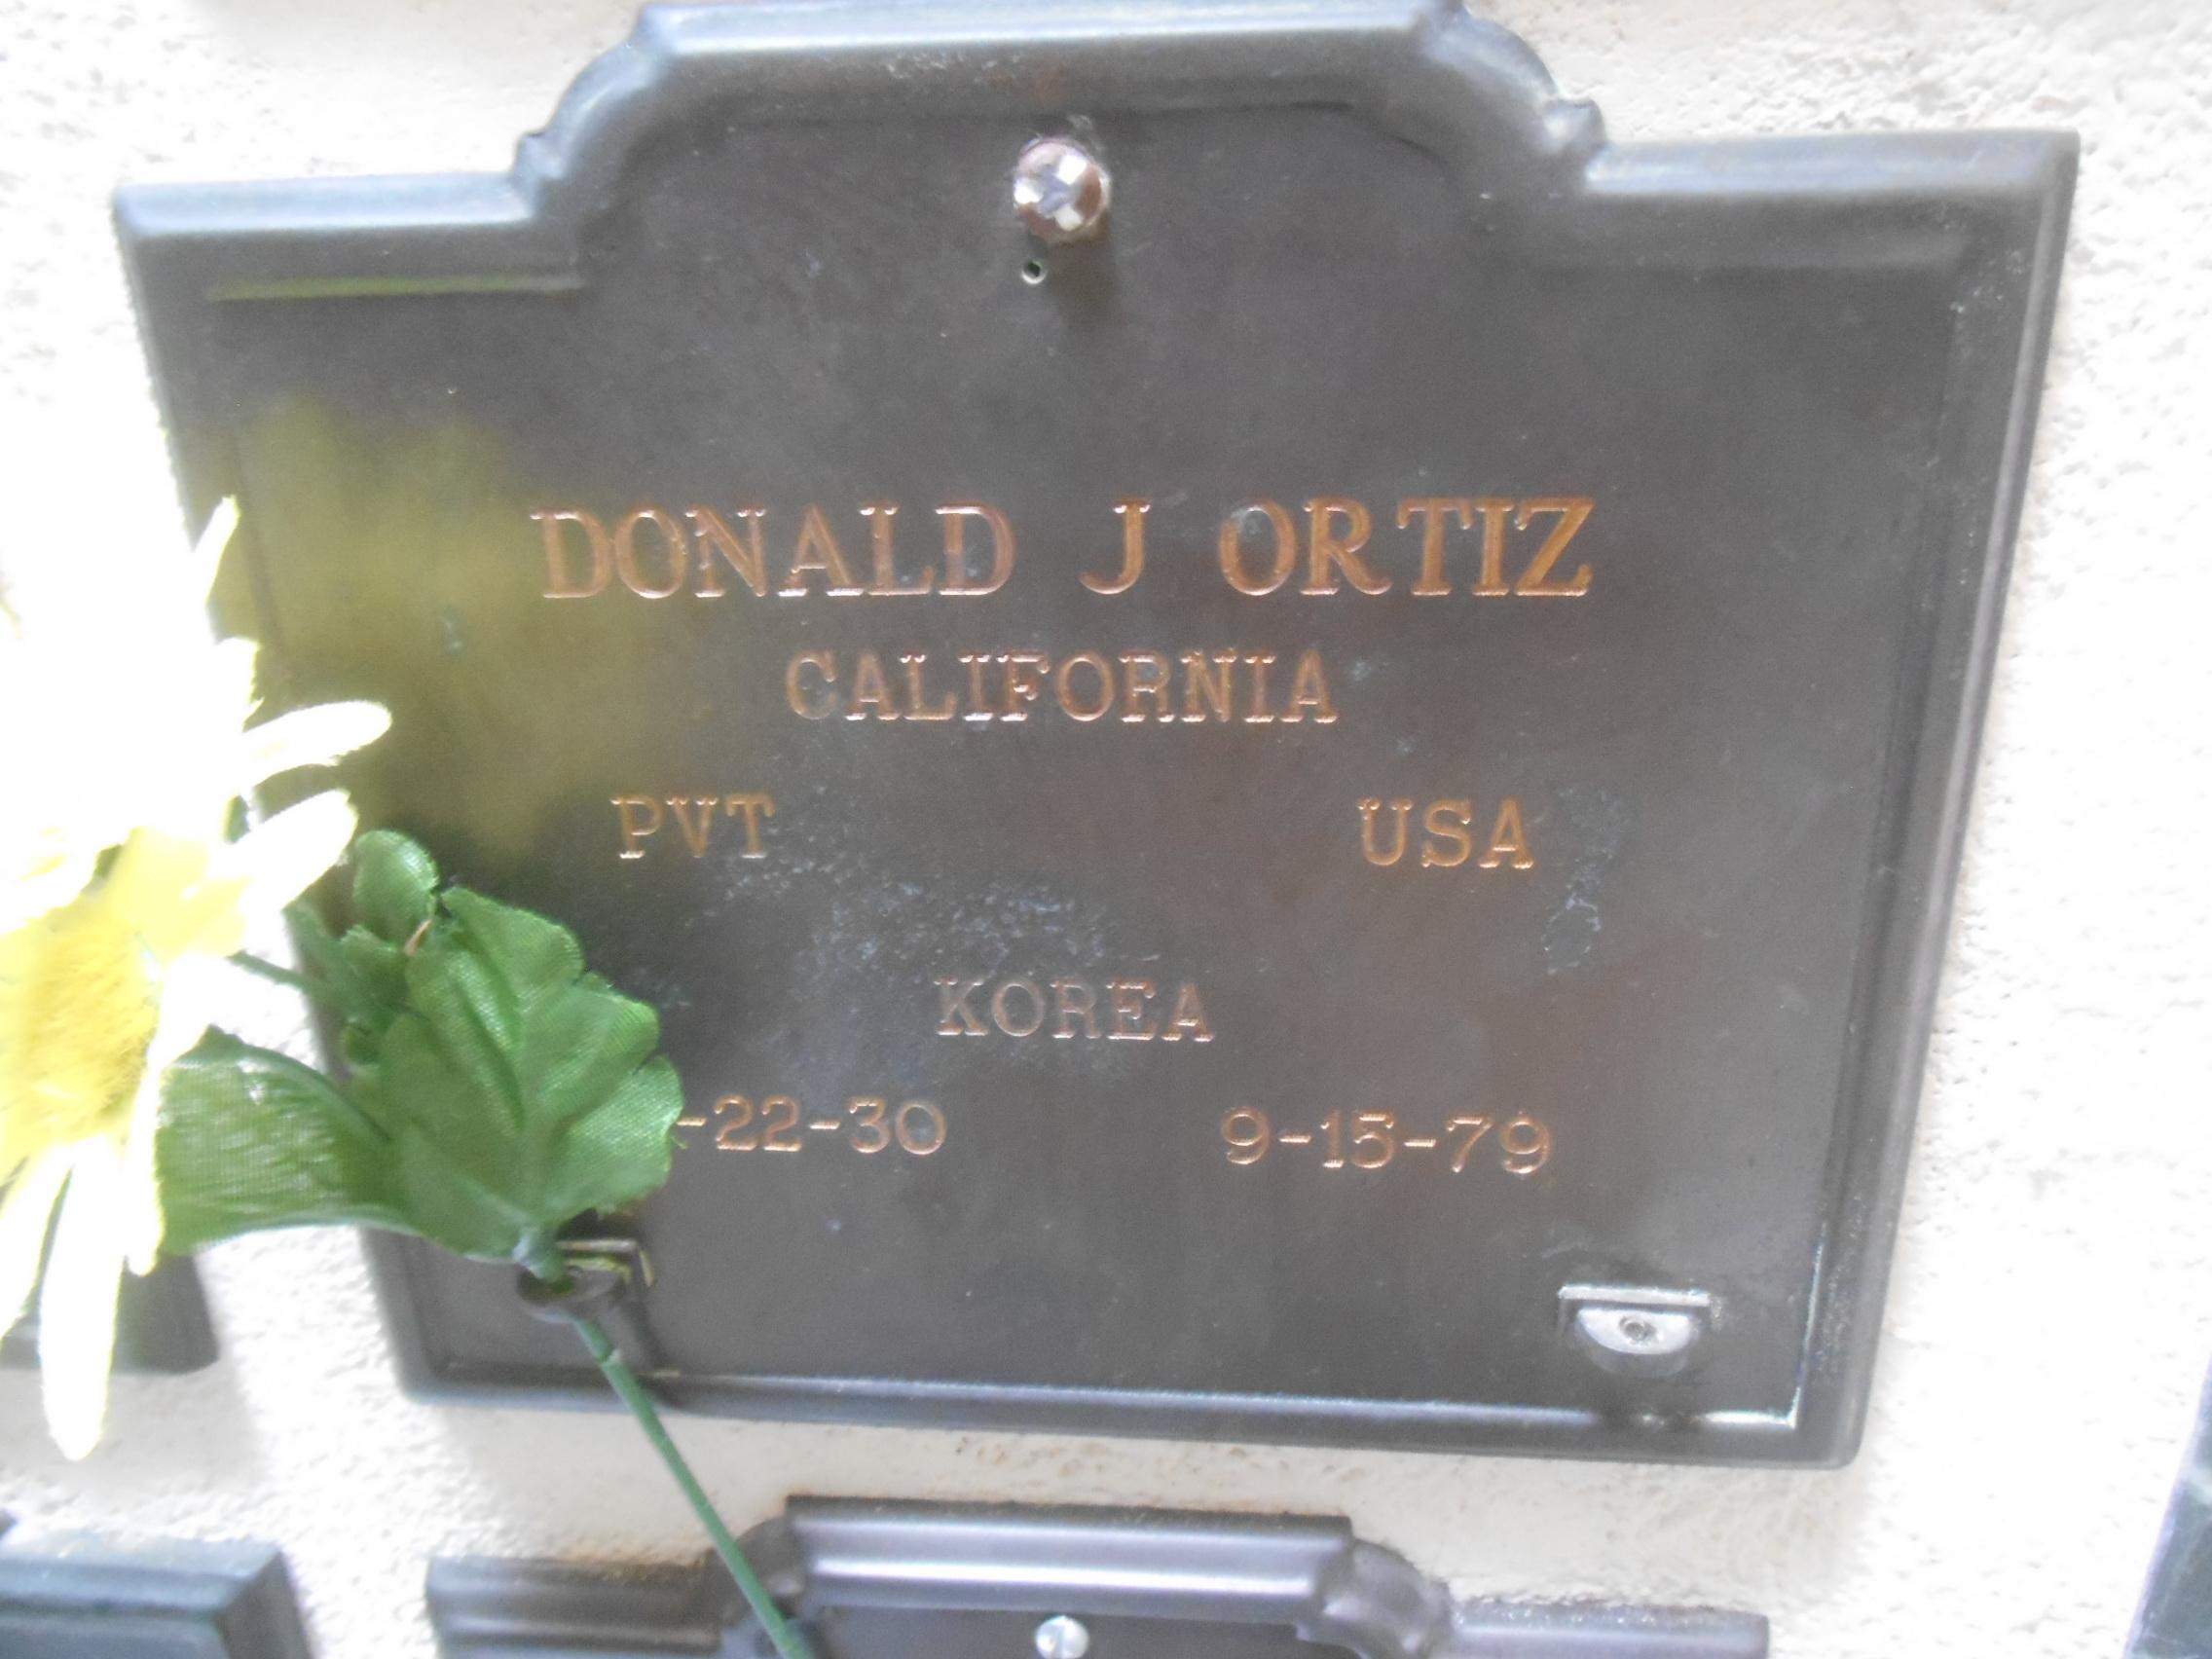 Donald Joseph Ortiz